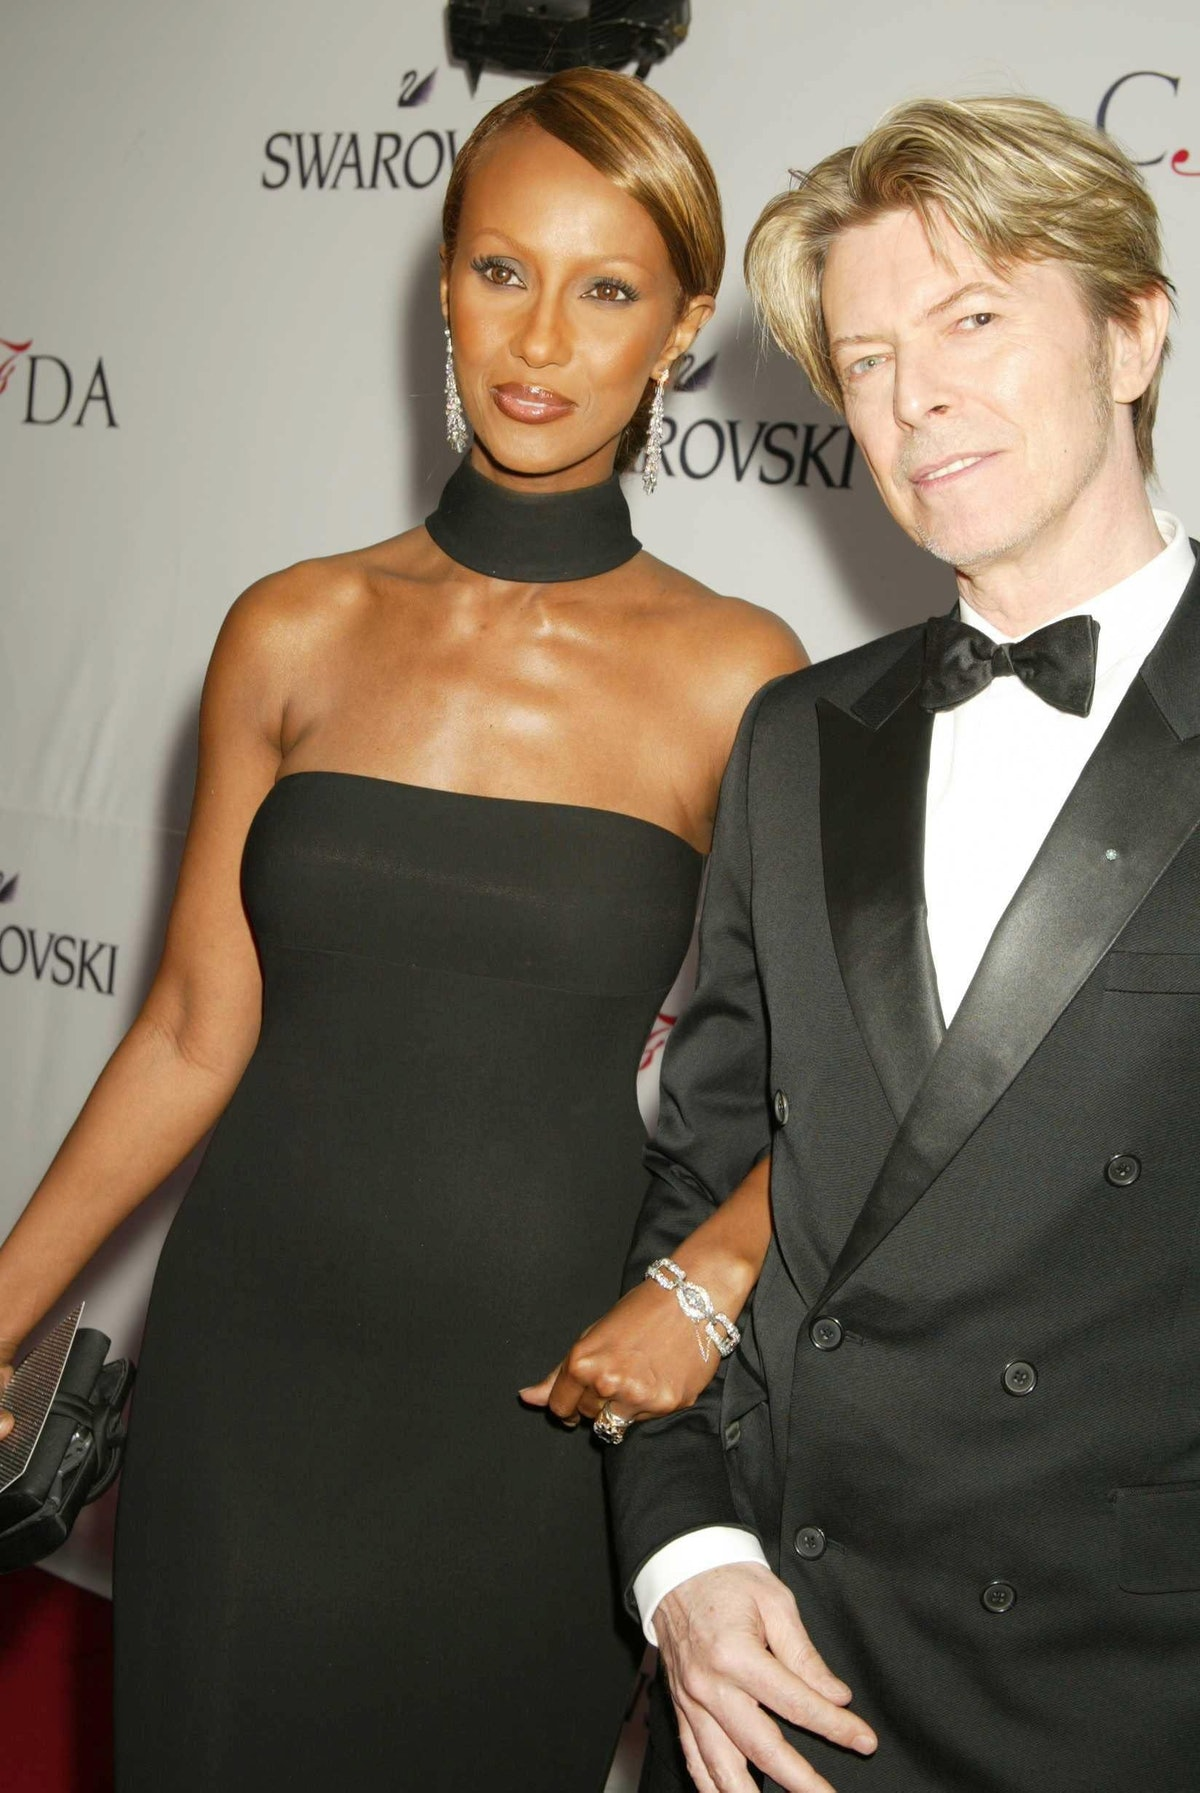 The 2002 CFDA Fashion Awards